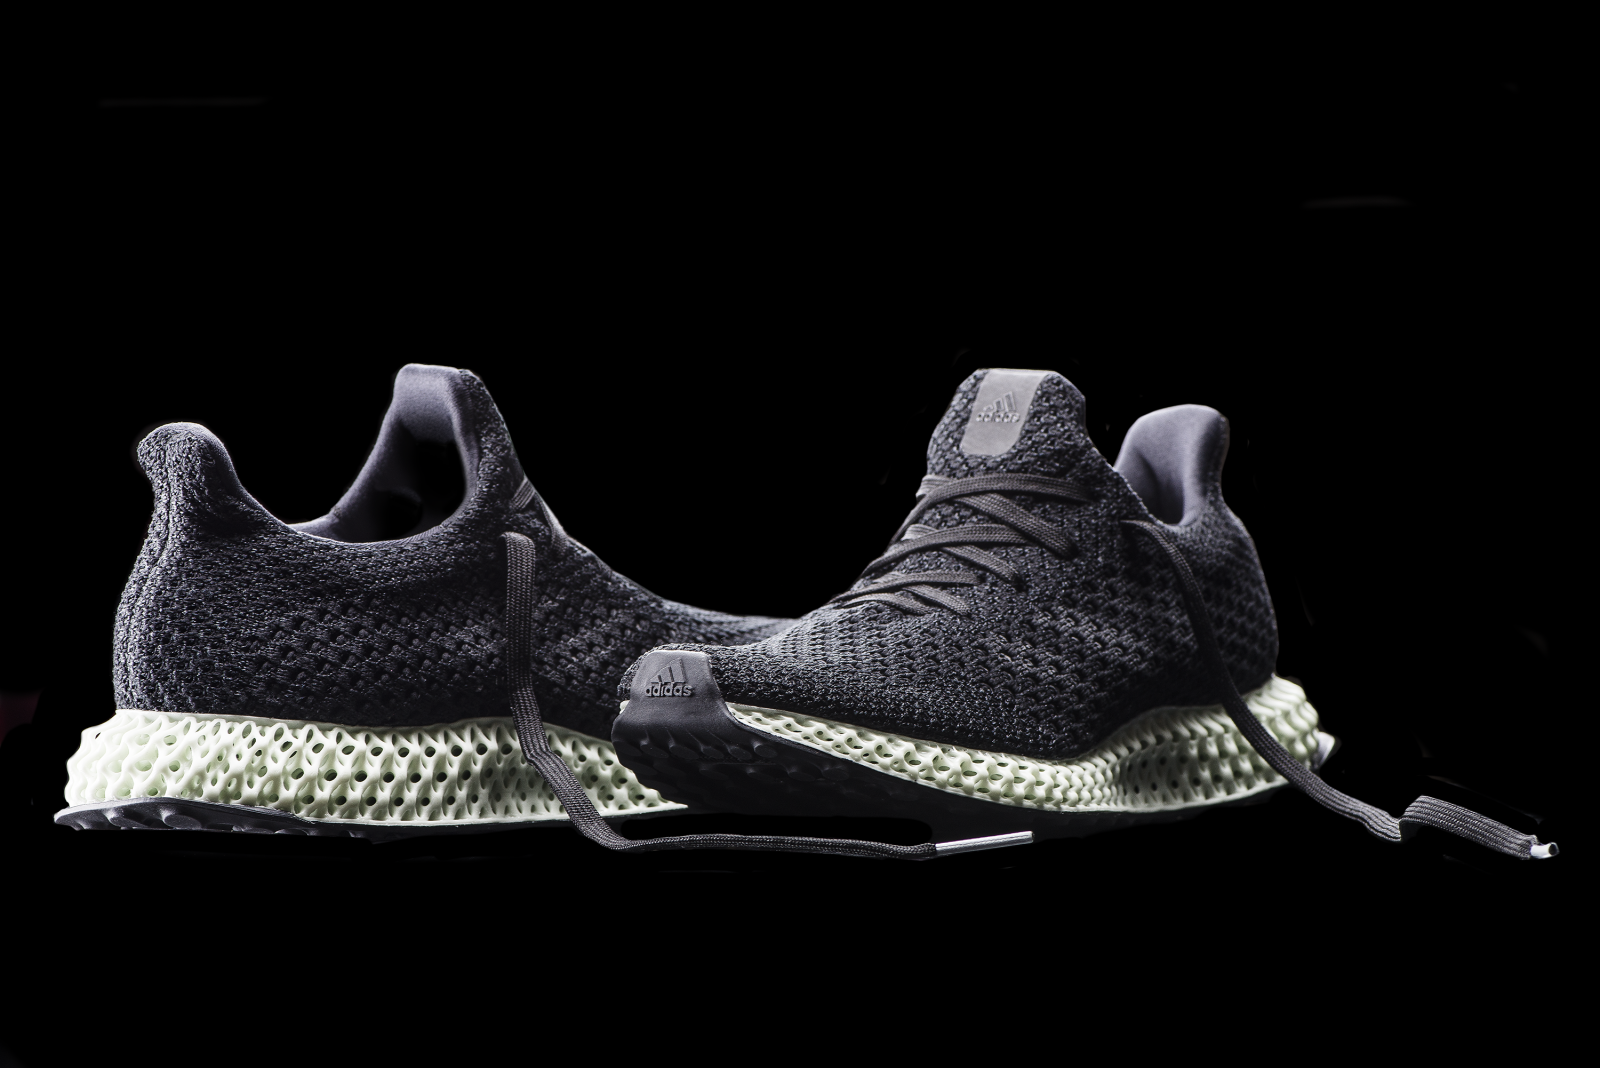 Adidas FutureCraft 4D 3D printed shoe